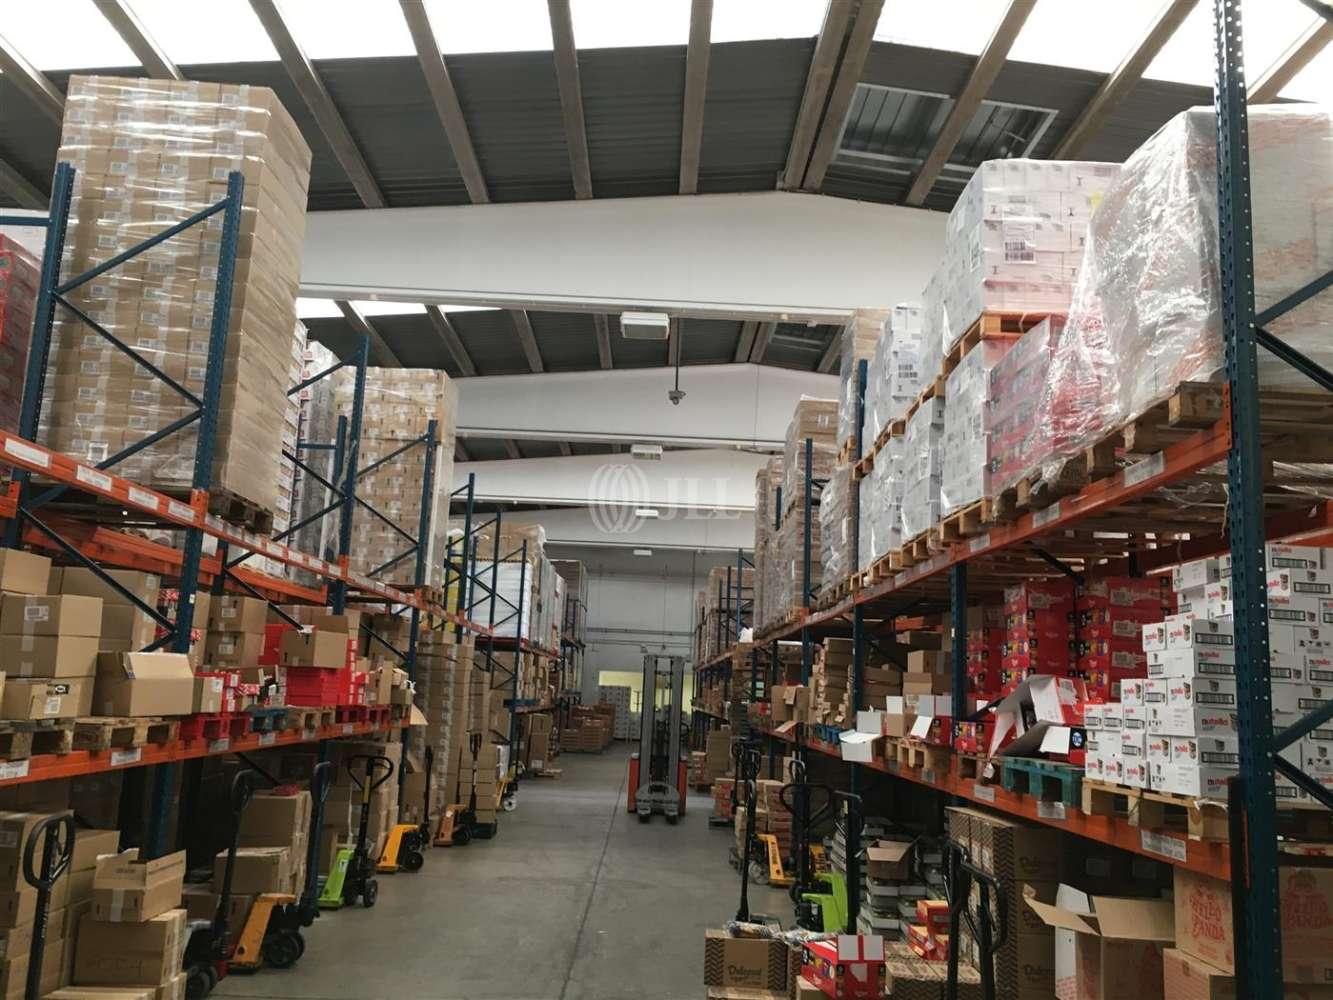 Naves industriales y logísticas Barberà del vallès, 08210 - Nave Industrial - B0507 - P.I CAN SALVATELLA - 22940